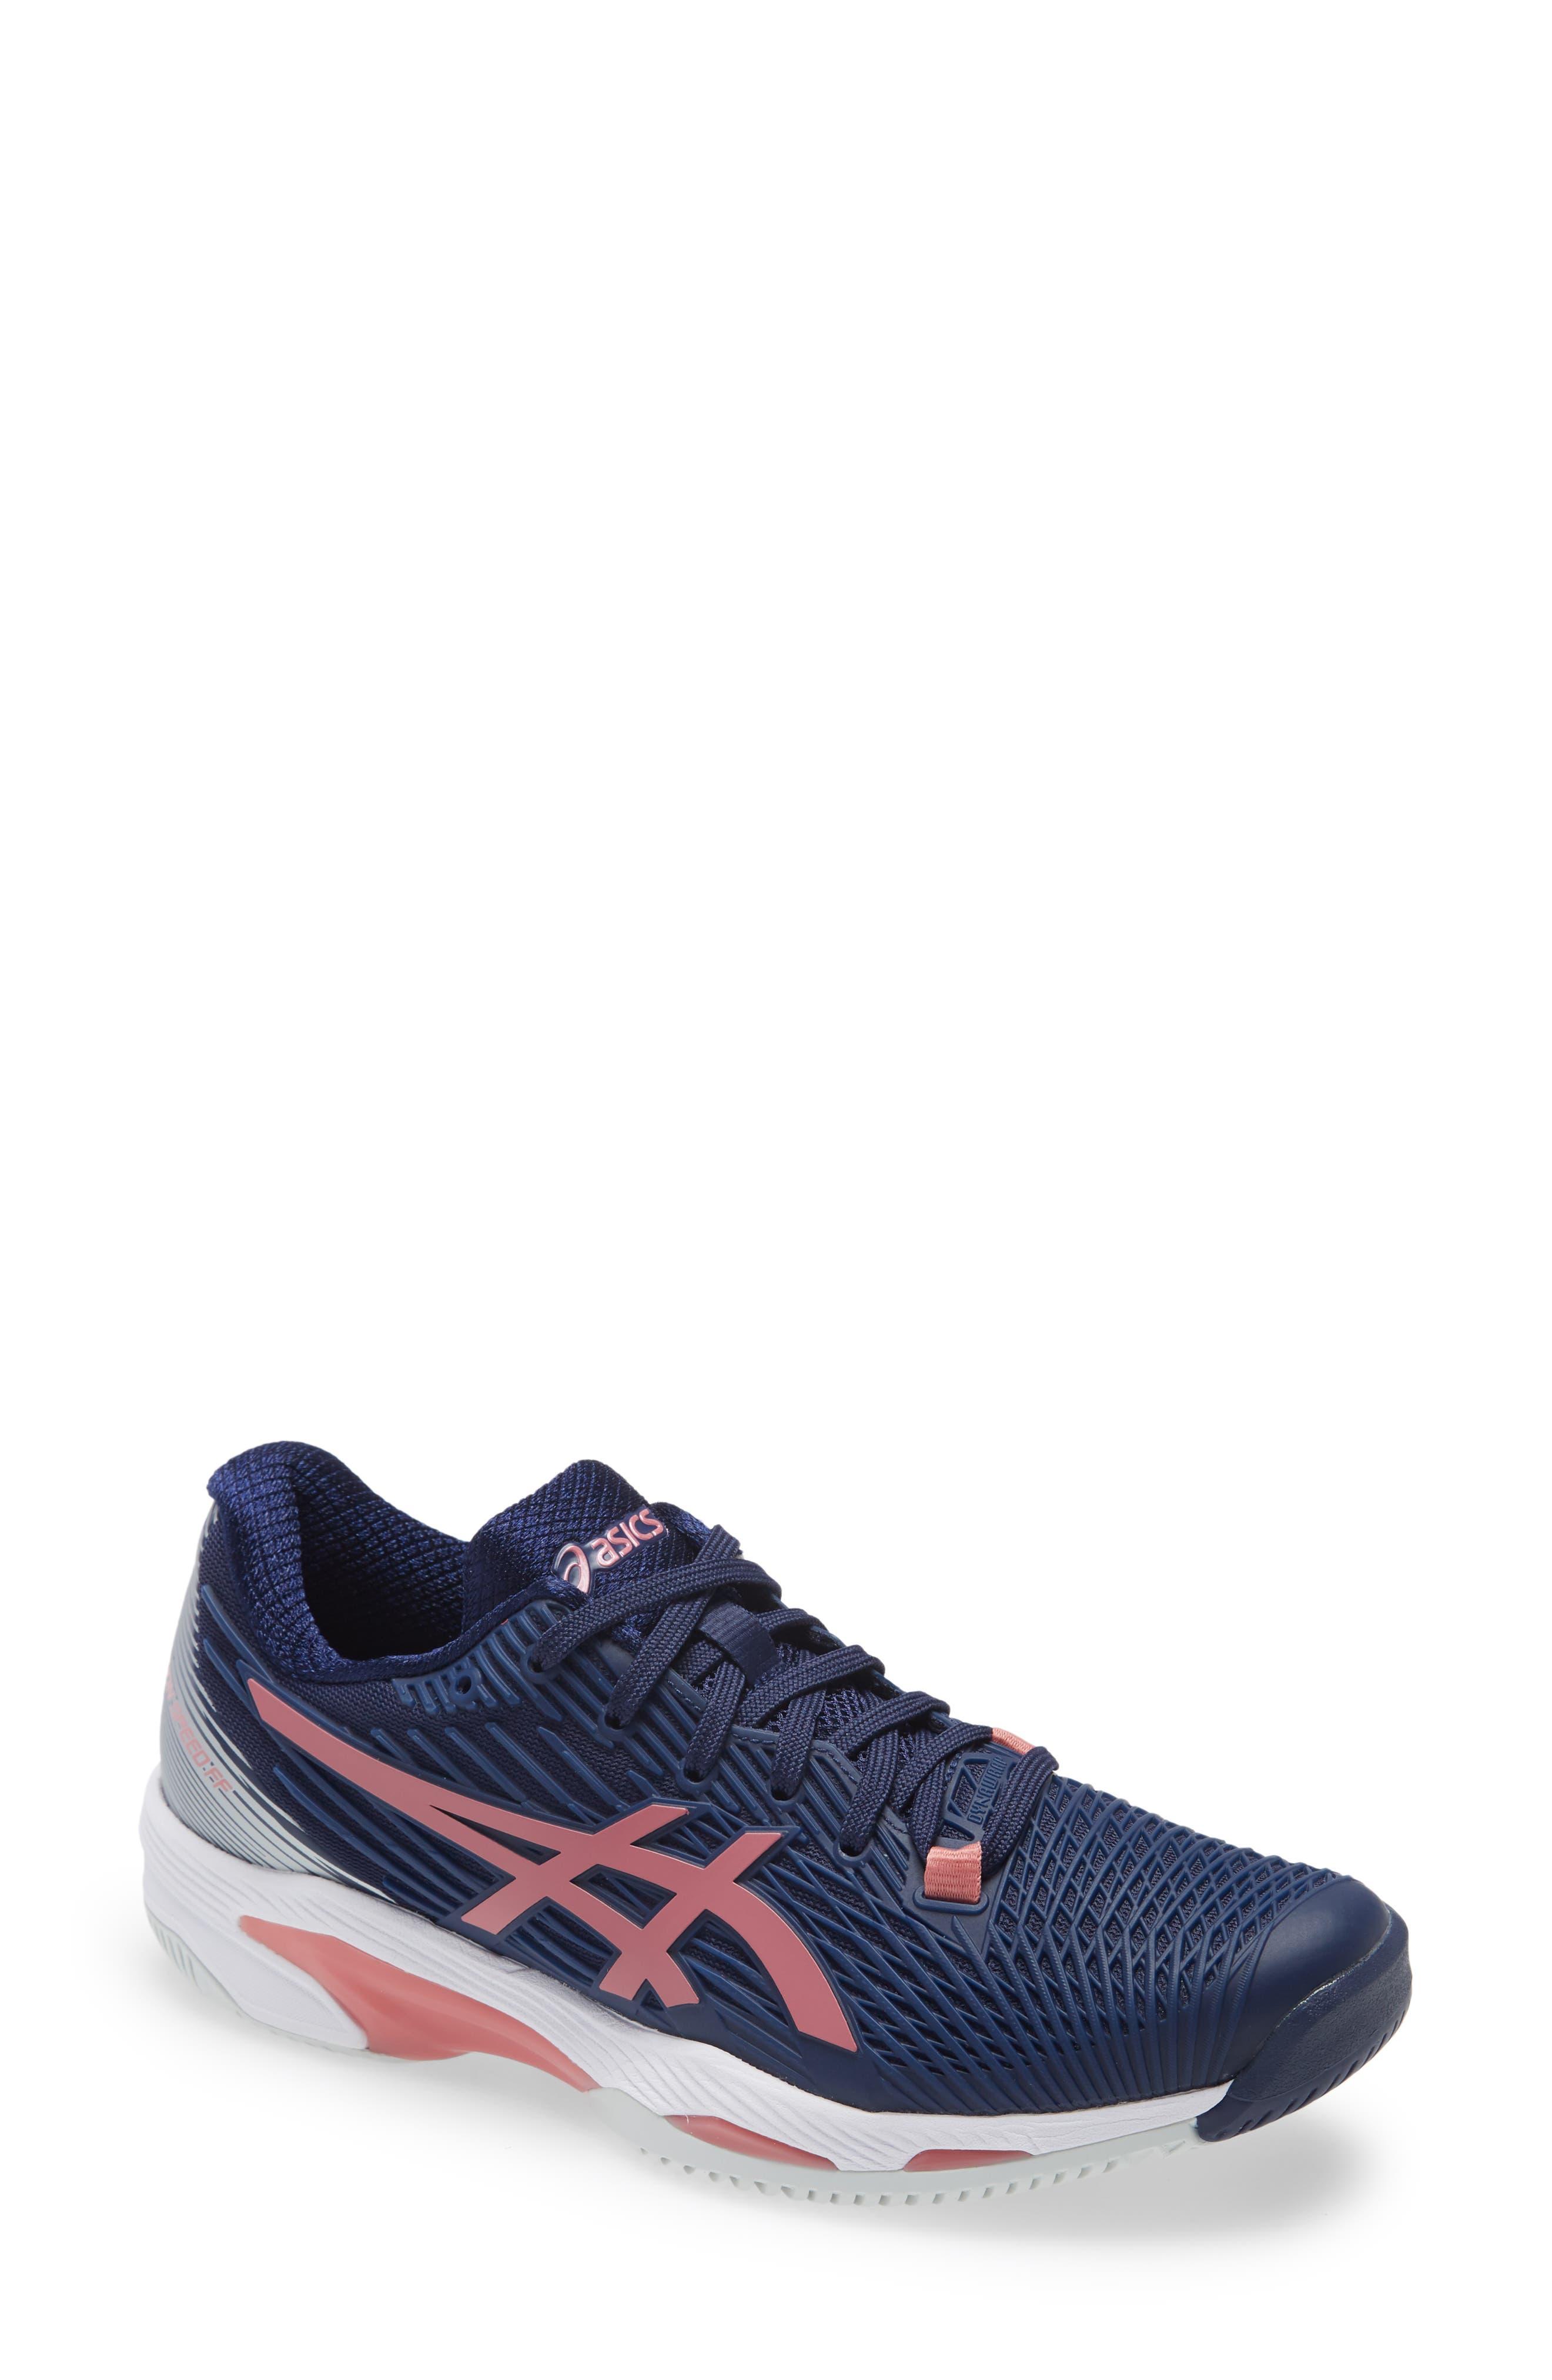 Women's Asics Solution Speed(TM) Ff 2 Tennis Shoe